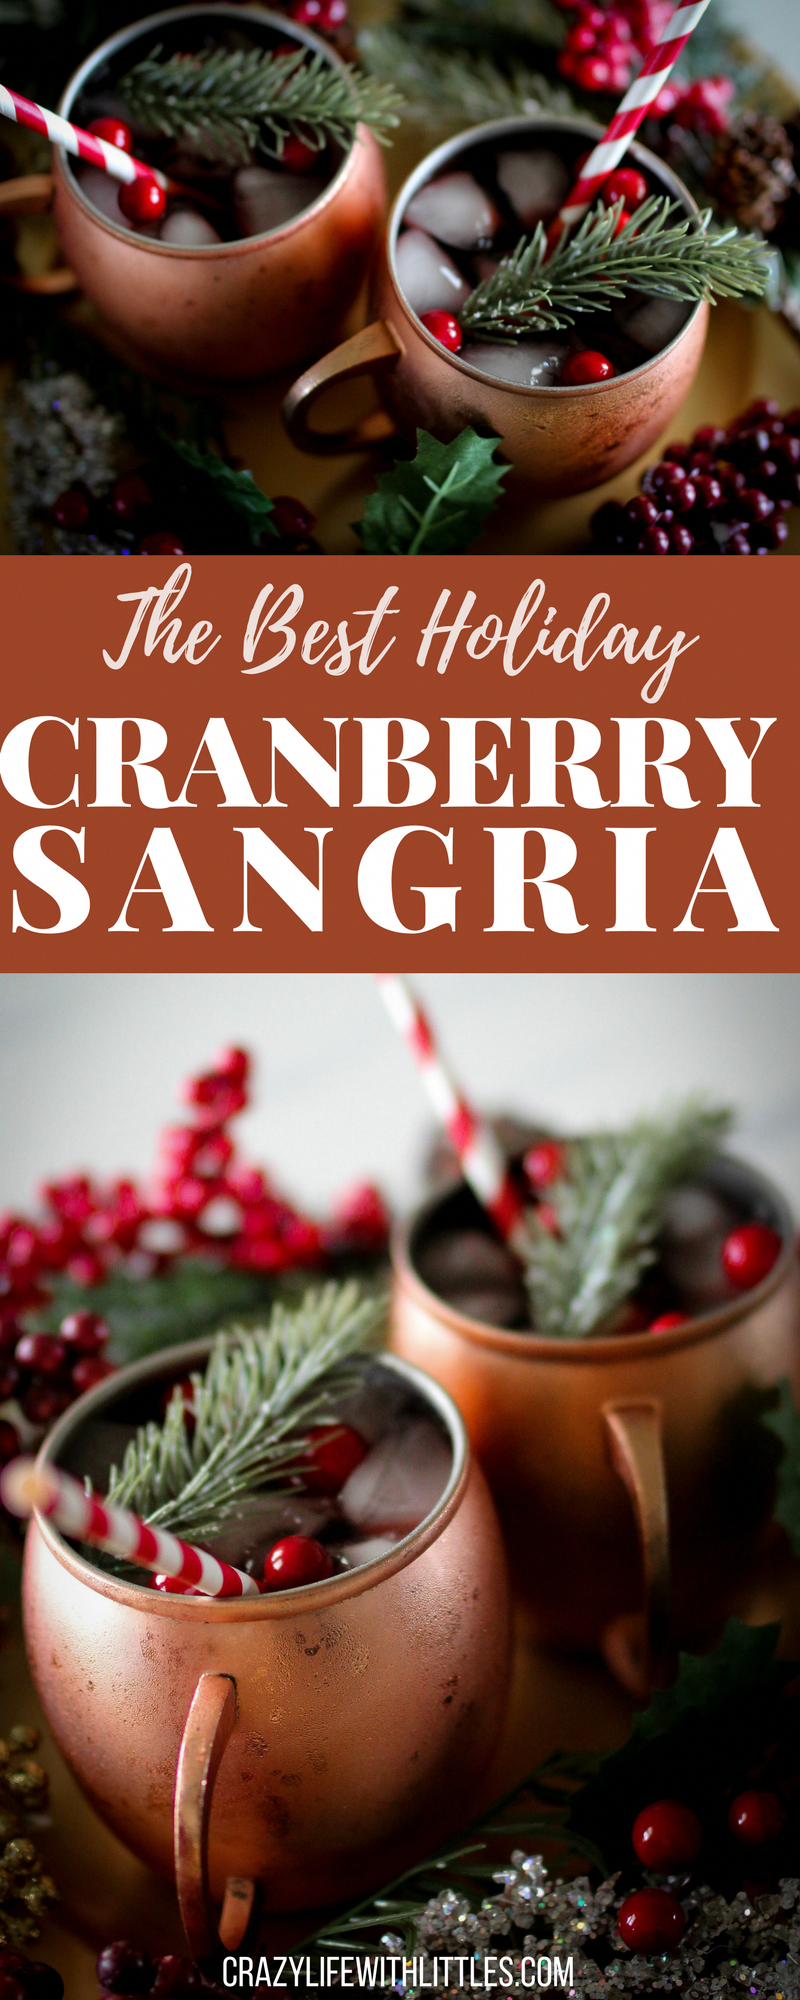 cranberry juice sangria sparkling cranberry sangria cranberry orange sangria rec